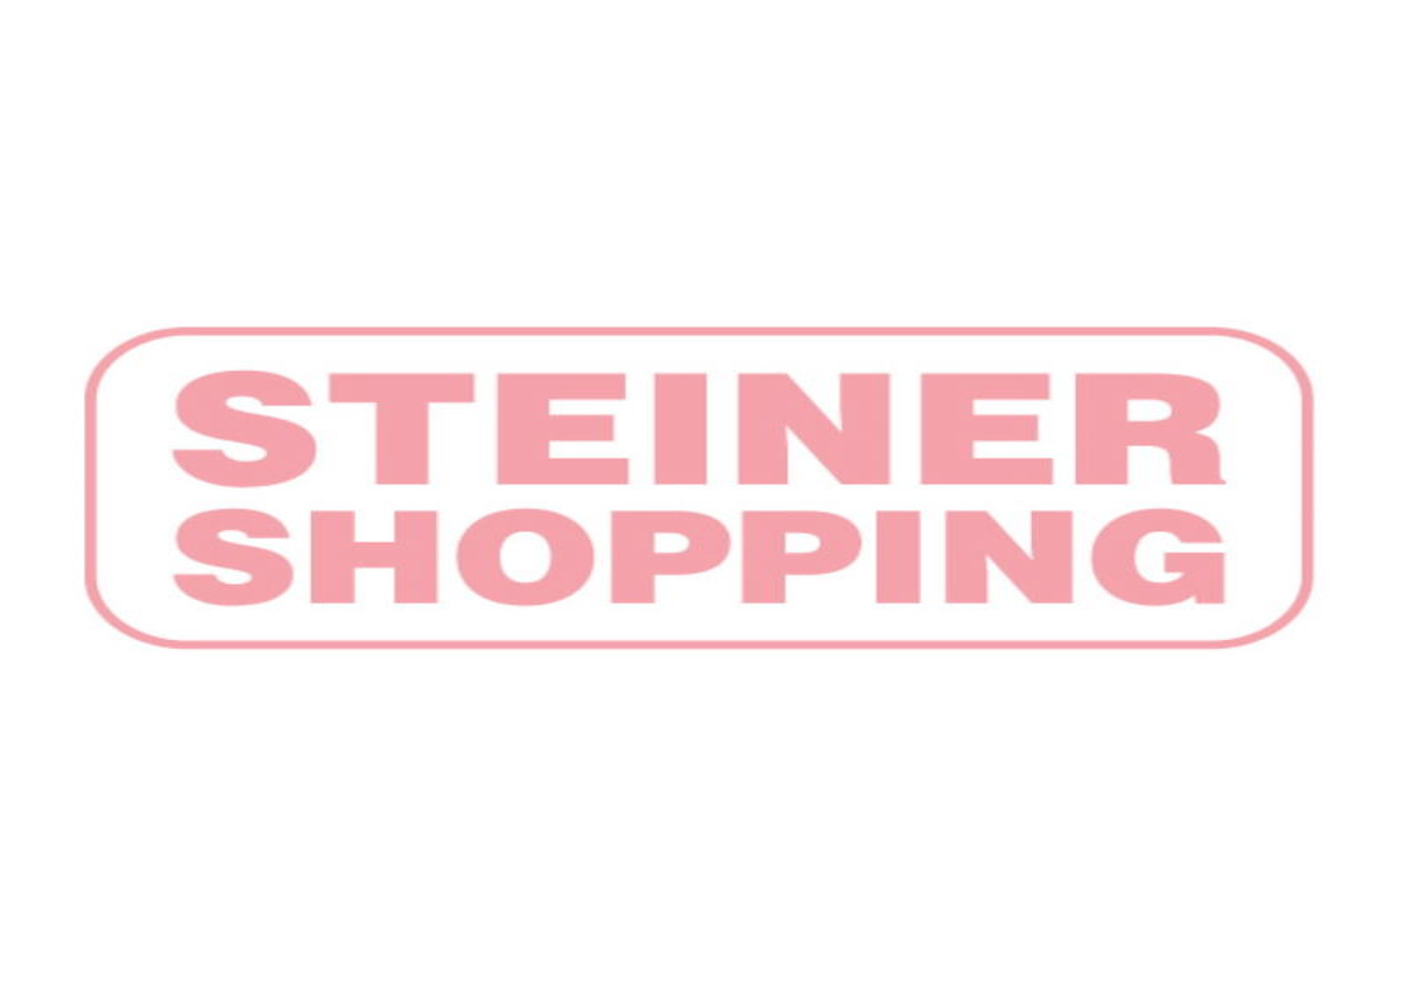 Pflanzbox Urban Garden Kid, Farbe: Grün, Maße: 41 x 90 x 40 cm (H x B x T)